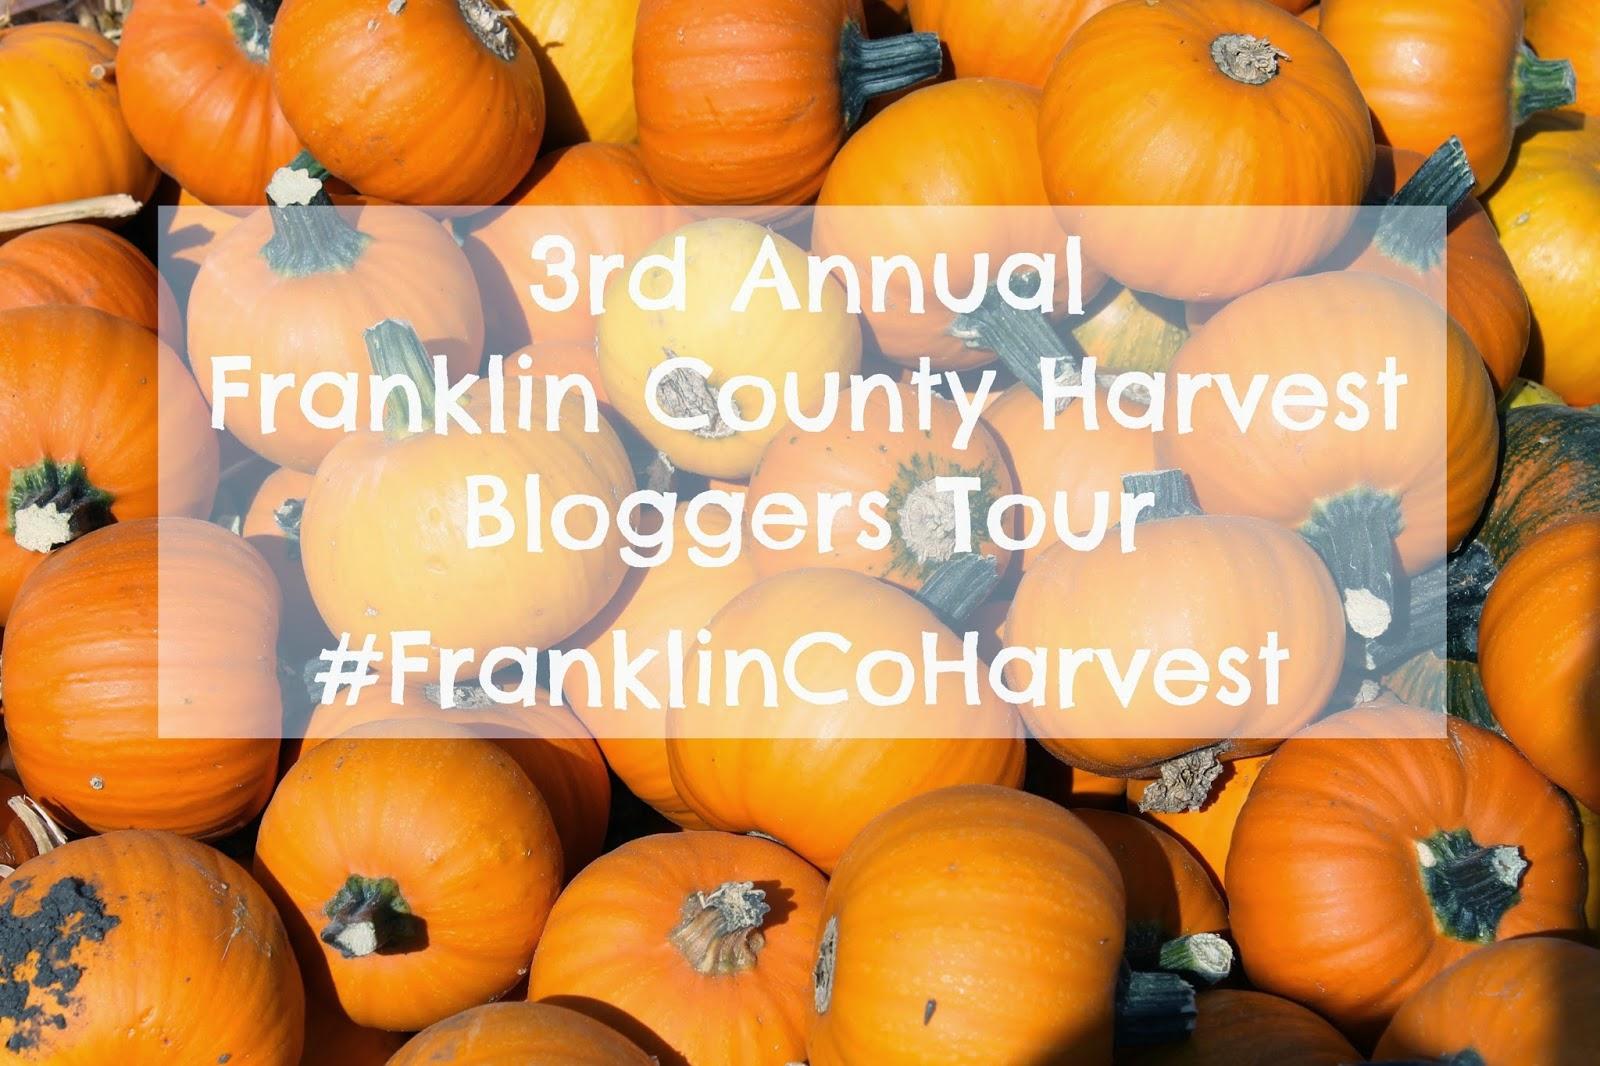 3rd Annual Franklin County Harvest Bloggers Tour #FranklinCoHarvest